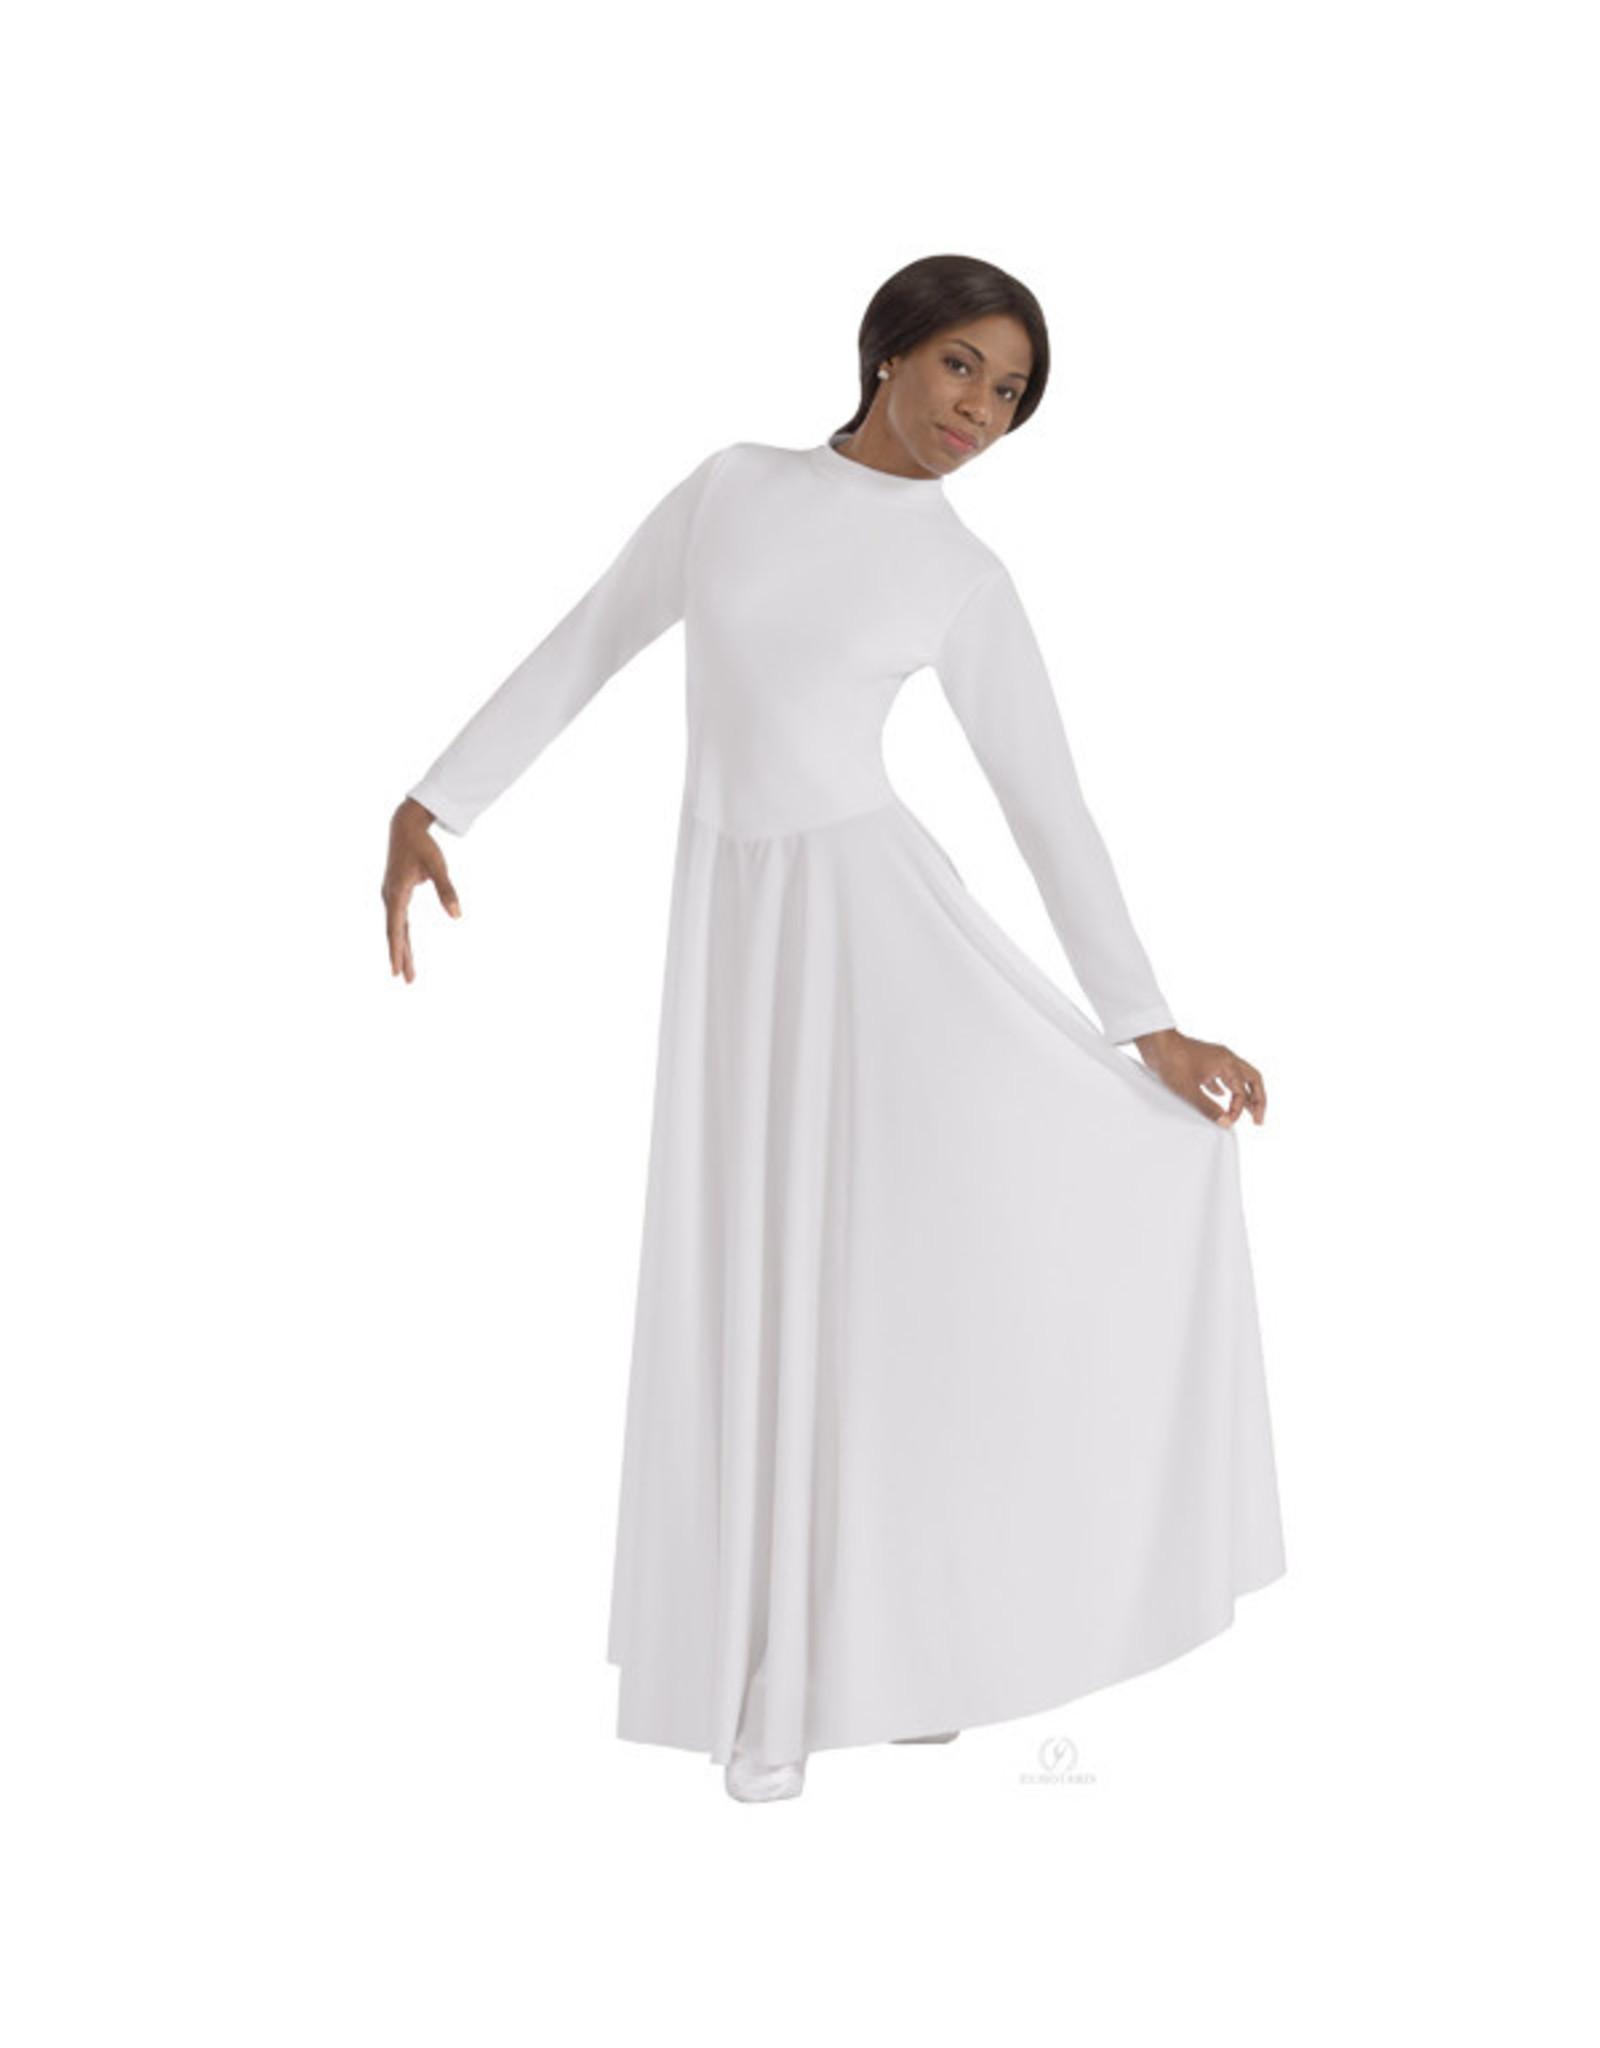 Eurotard 13847  High Neck Simplicity Praise Dress WHITE